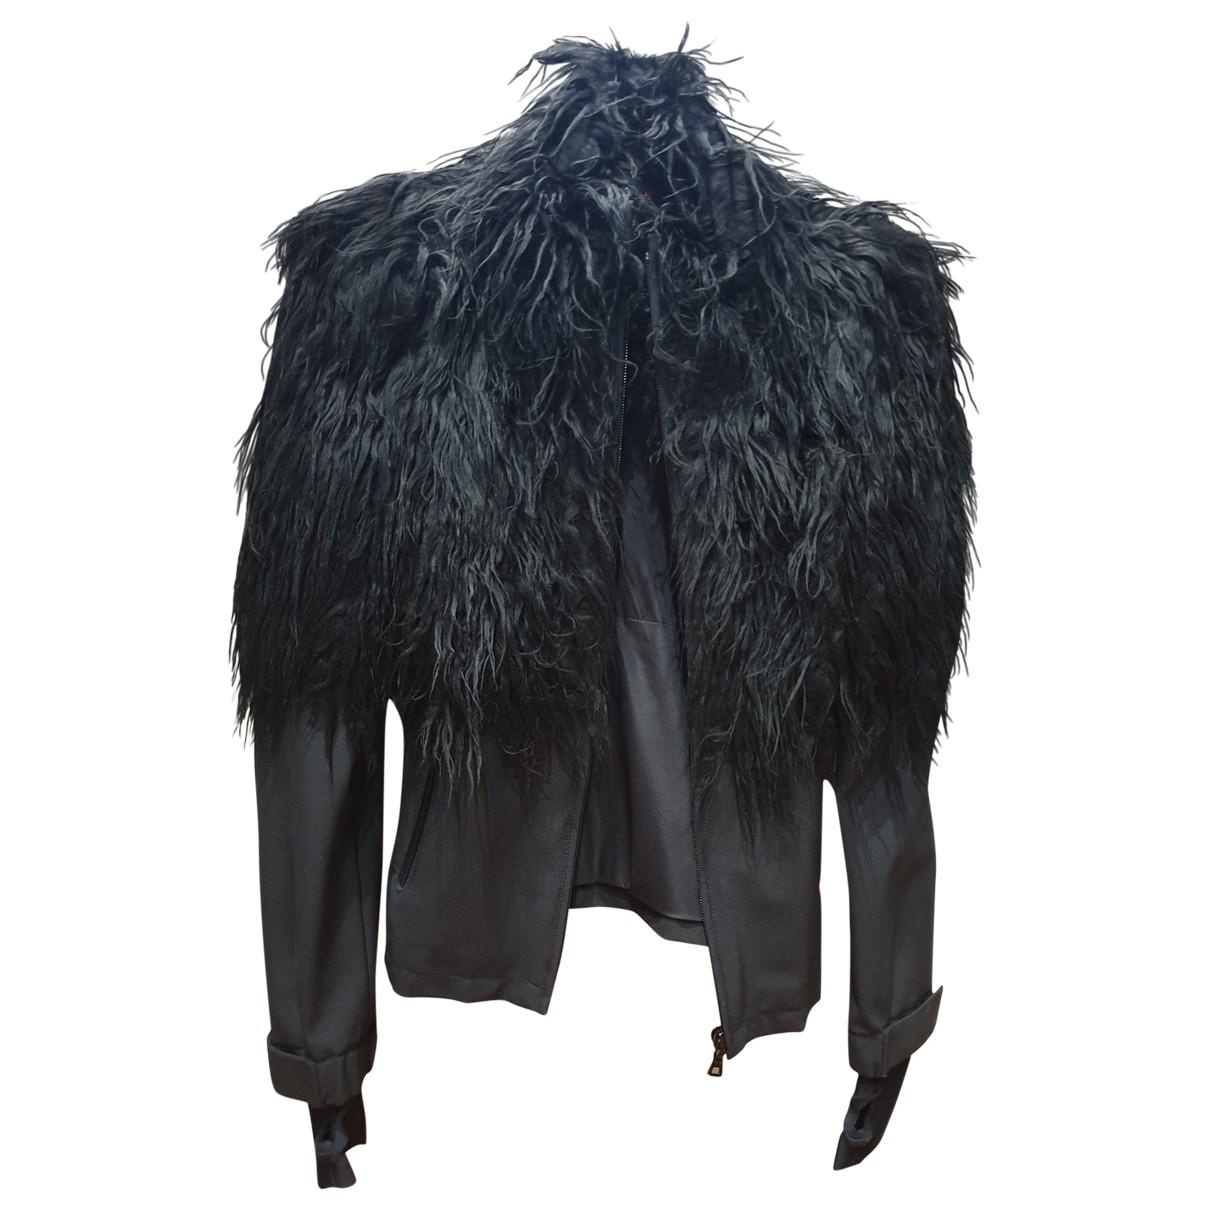 Prada \N Black jacket for Women 38 IT